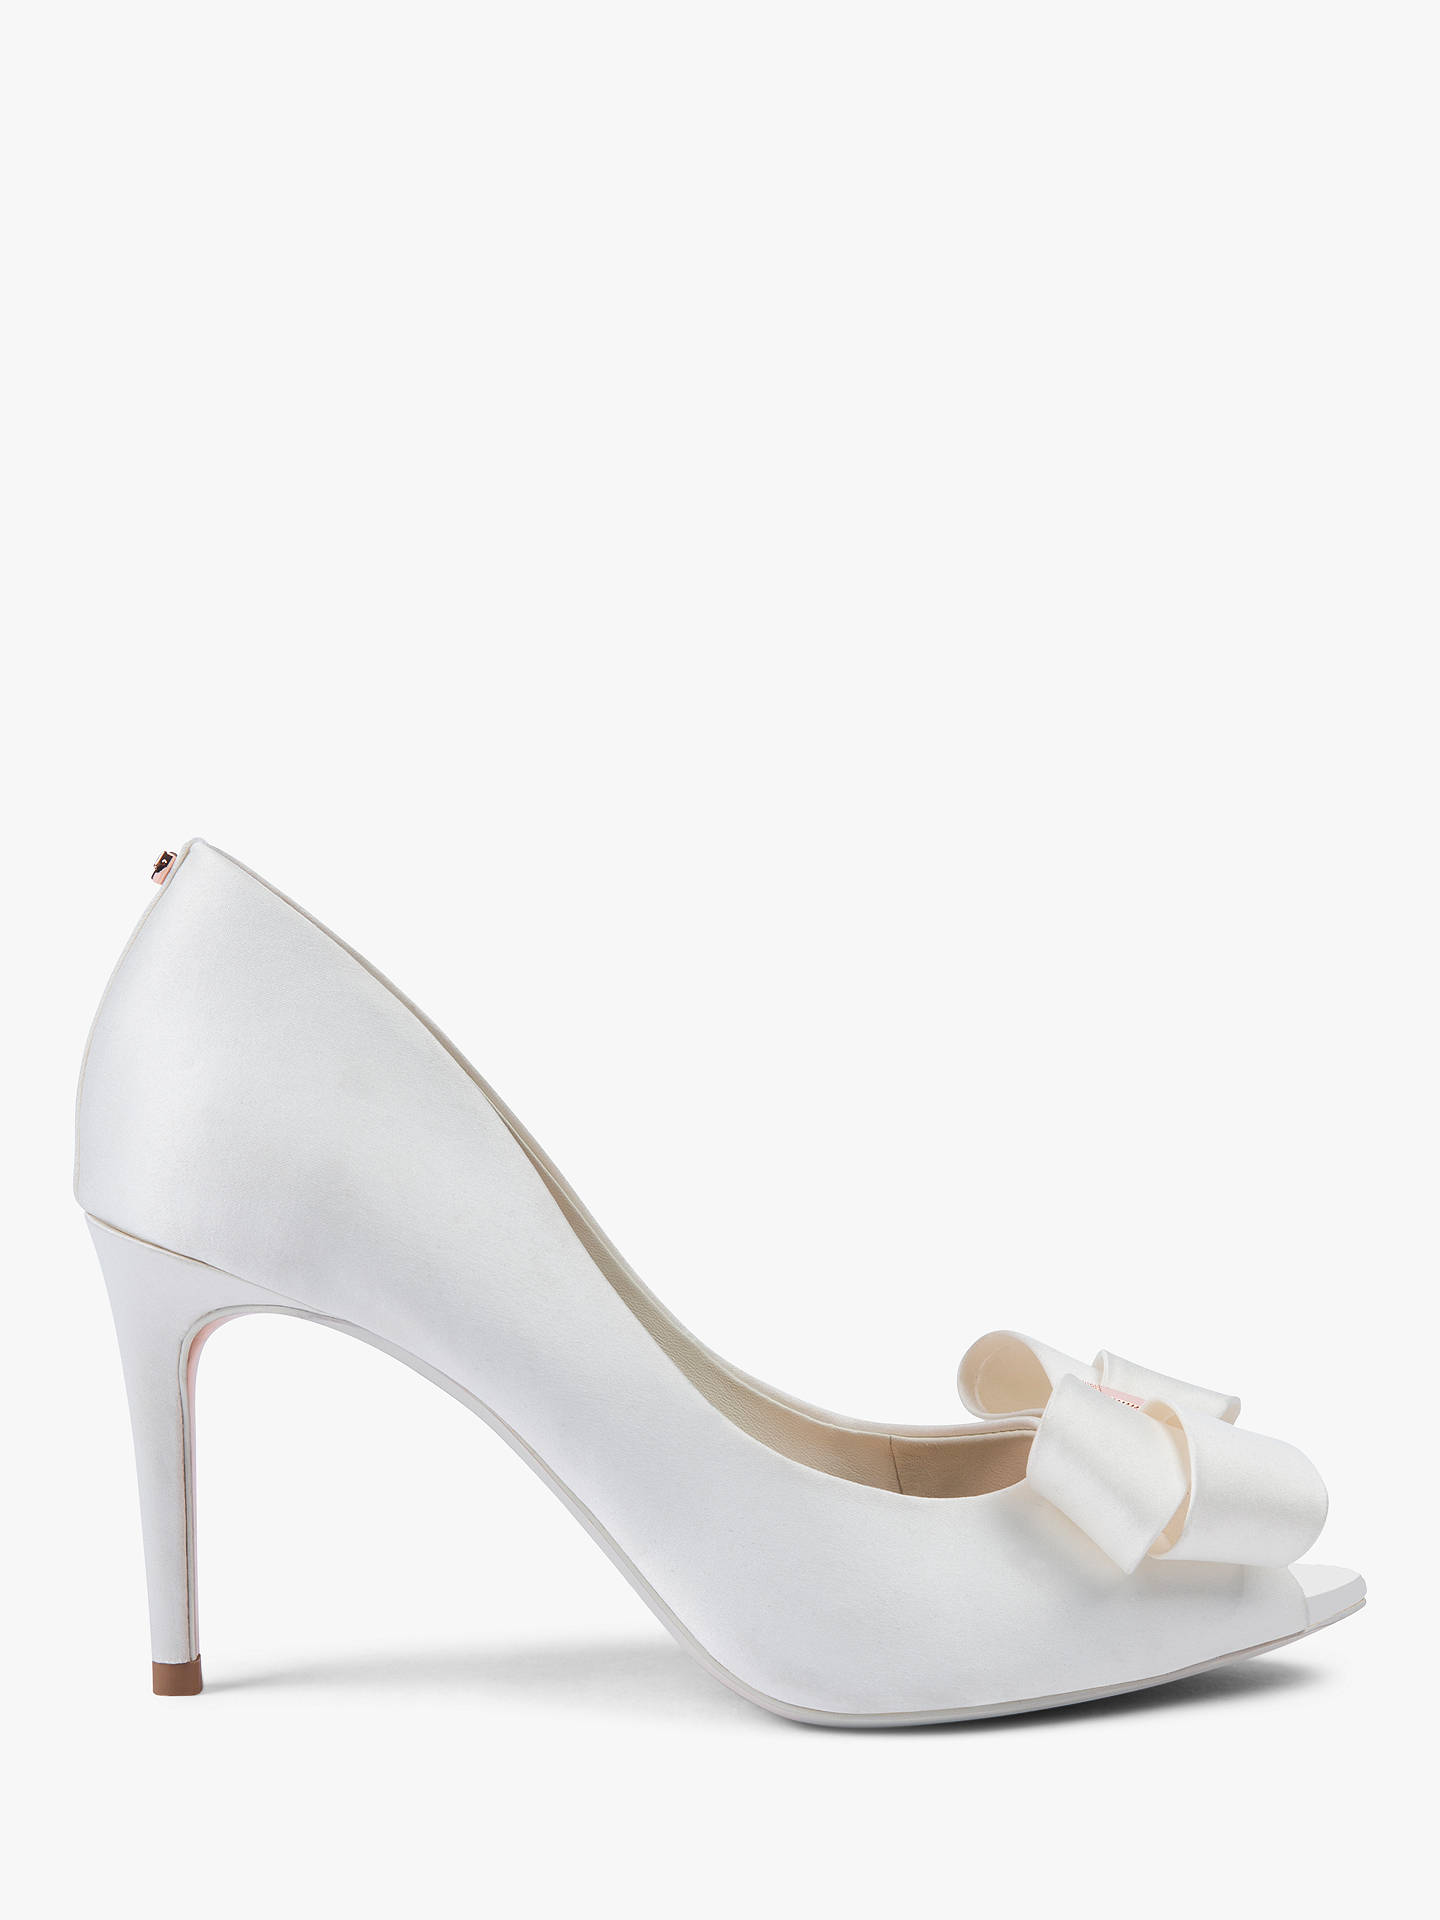 e0e8057886eb2 Buy Ted Baker Vylett Bow Peep Toe Court Shoes